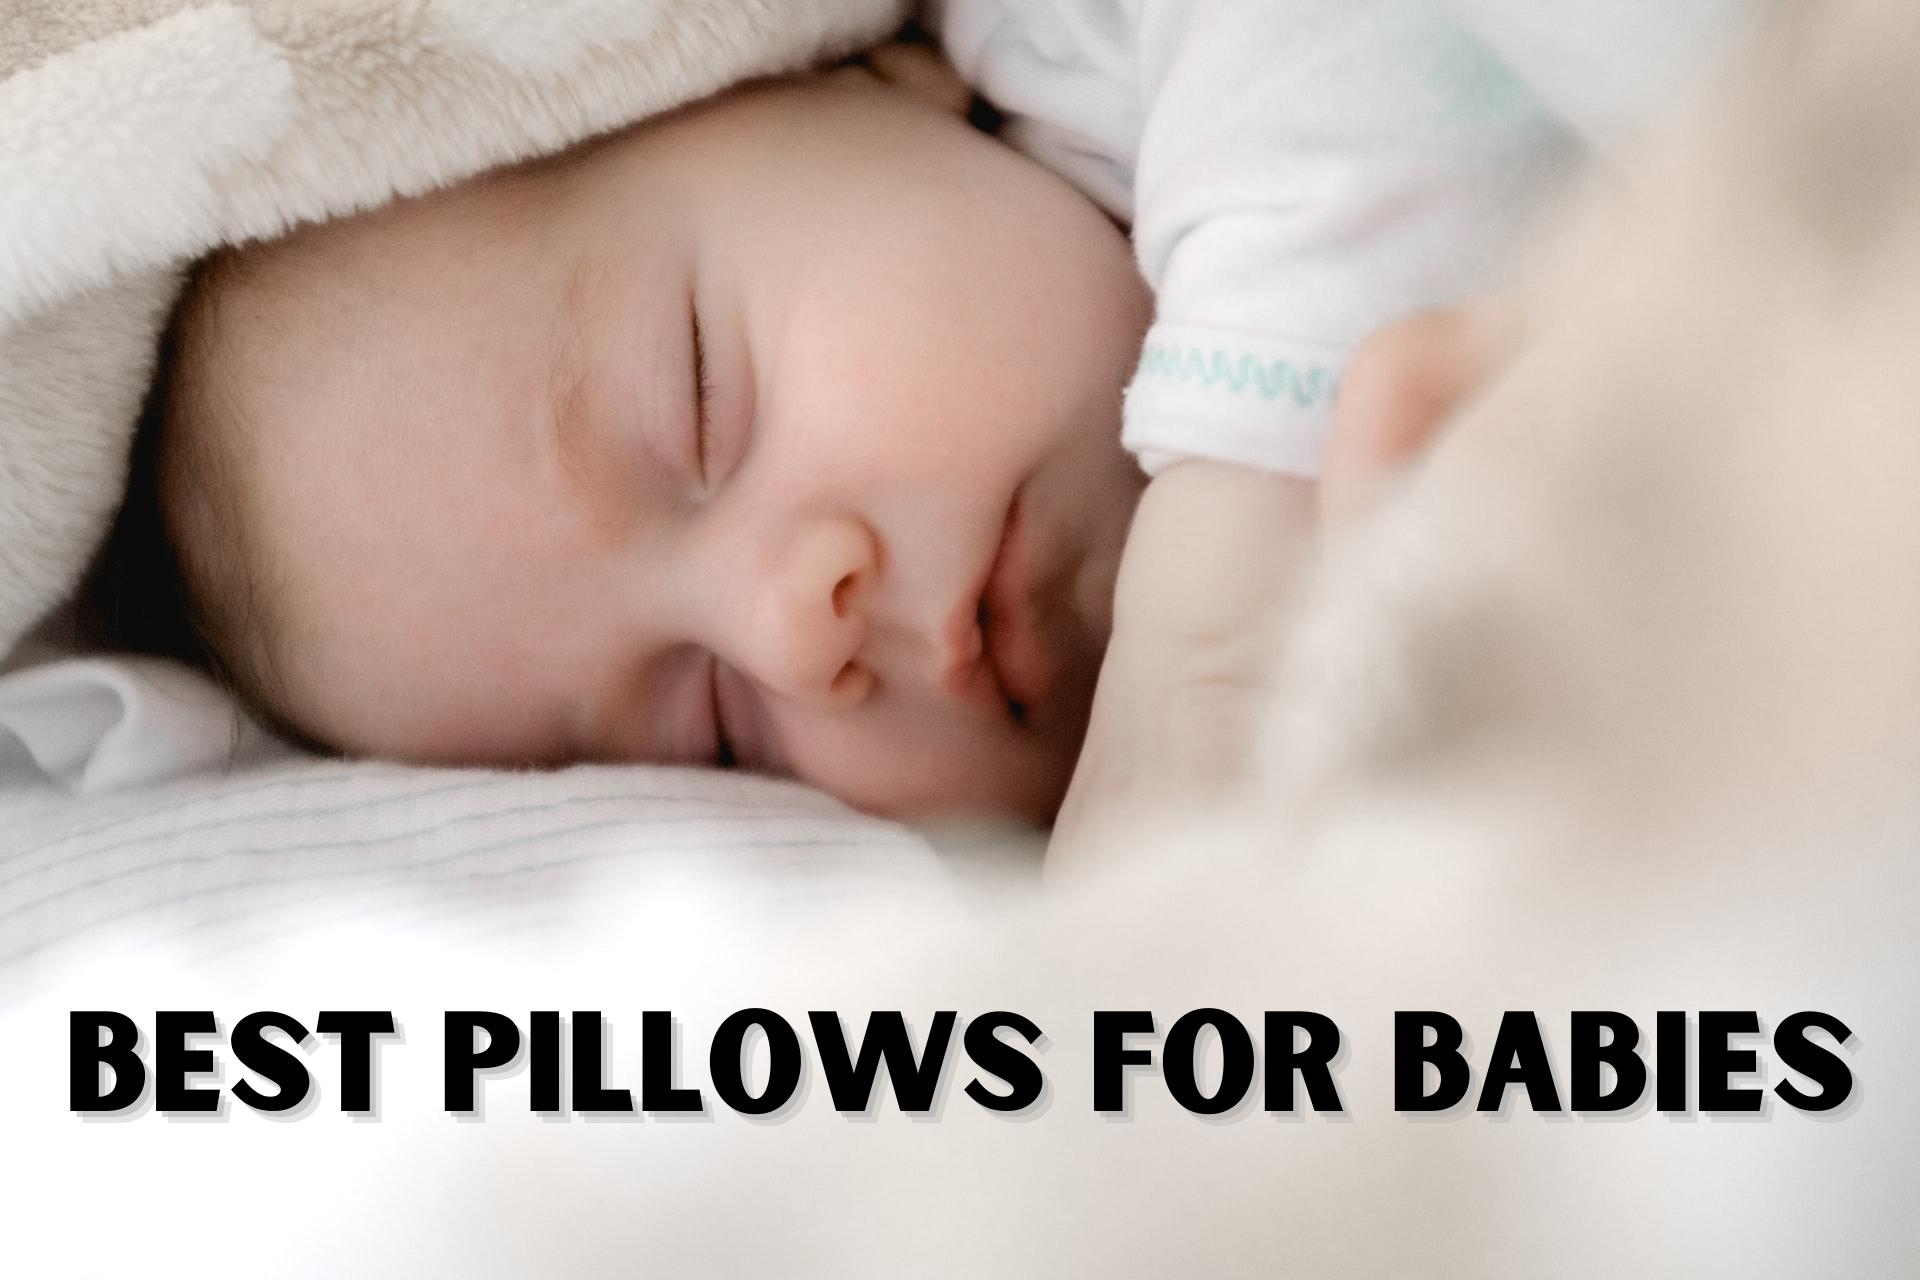 BEST PILLOWS FOR BABIES